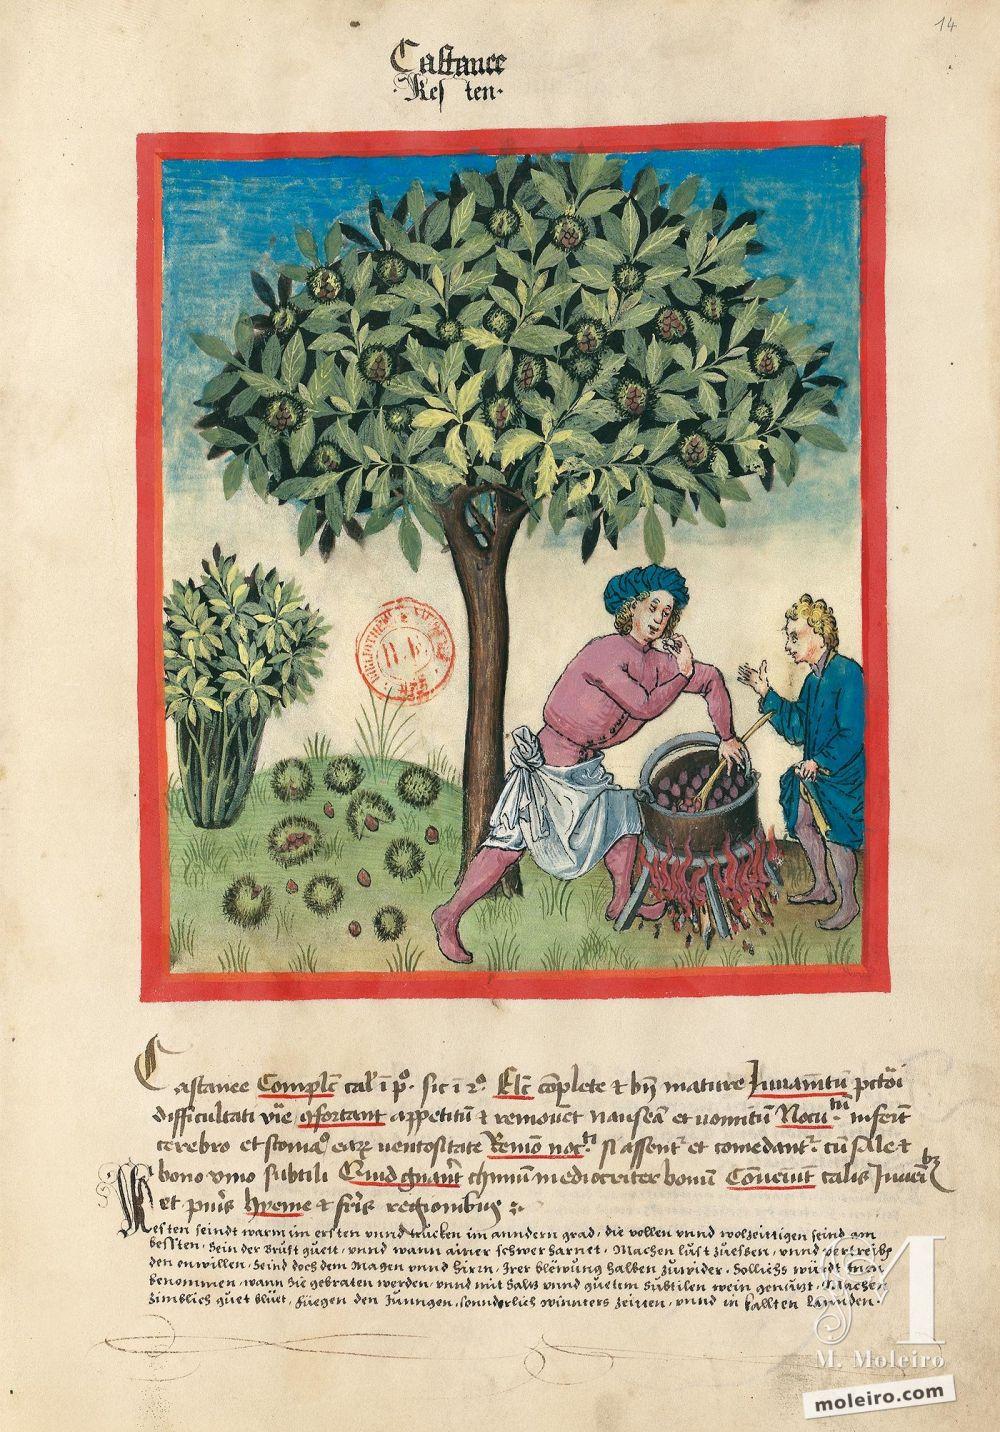 f. 14r, Castagne. Tacuinum Sanitatis, Ms. Lat. 9333. Bibliothèque nationale de France, Parigi